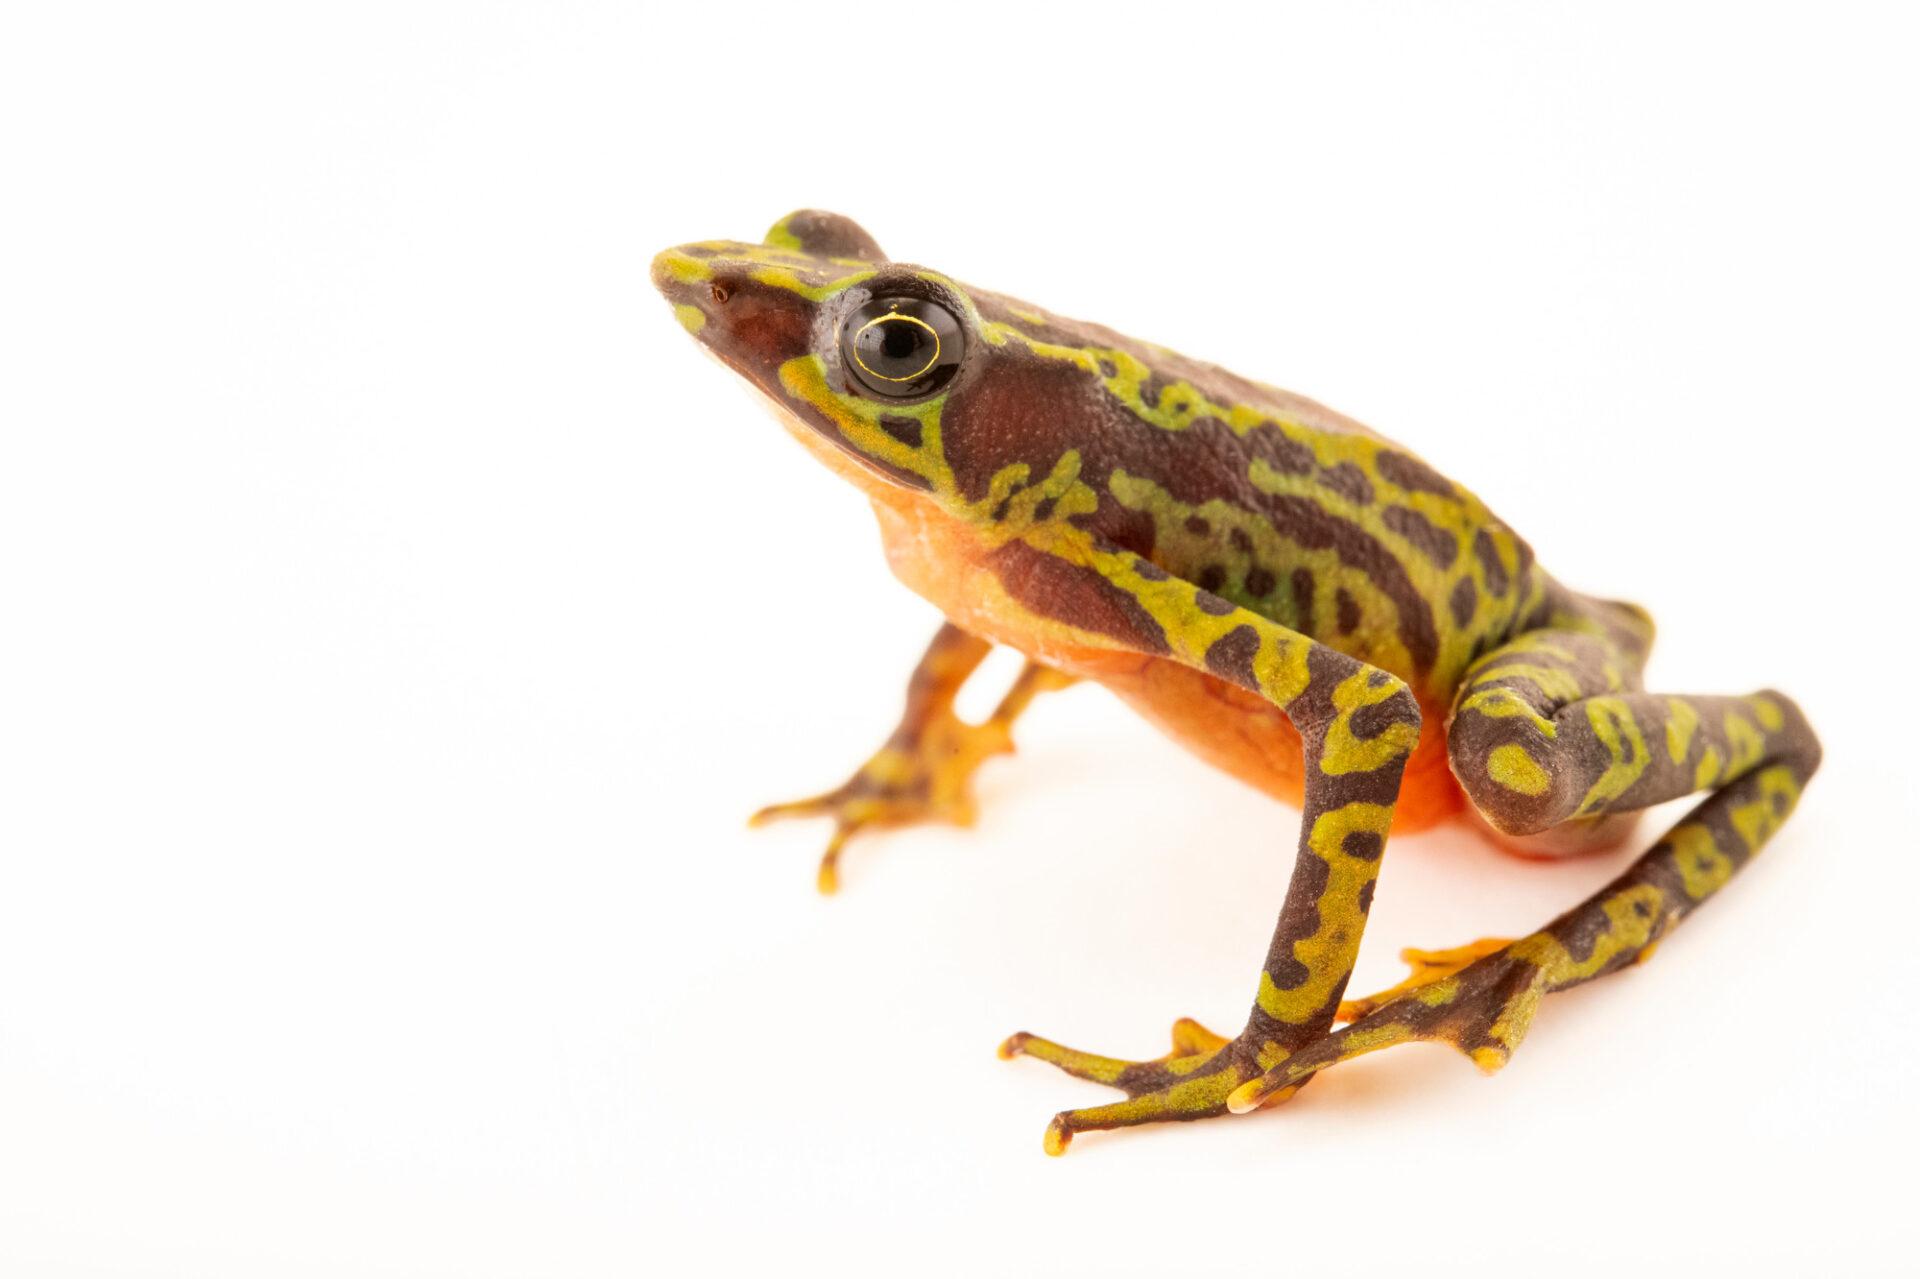 Photo: A critically endangered webbed harlequin frog, (Atelopus palmatus) a at Centro Jambatu in Quito, Ecuador.